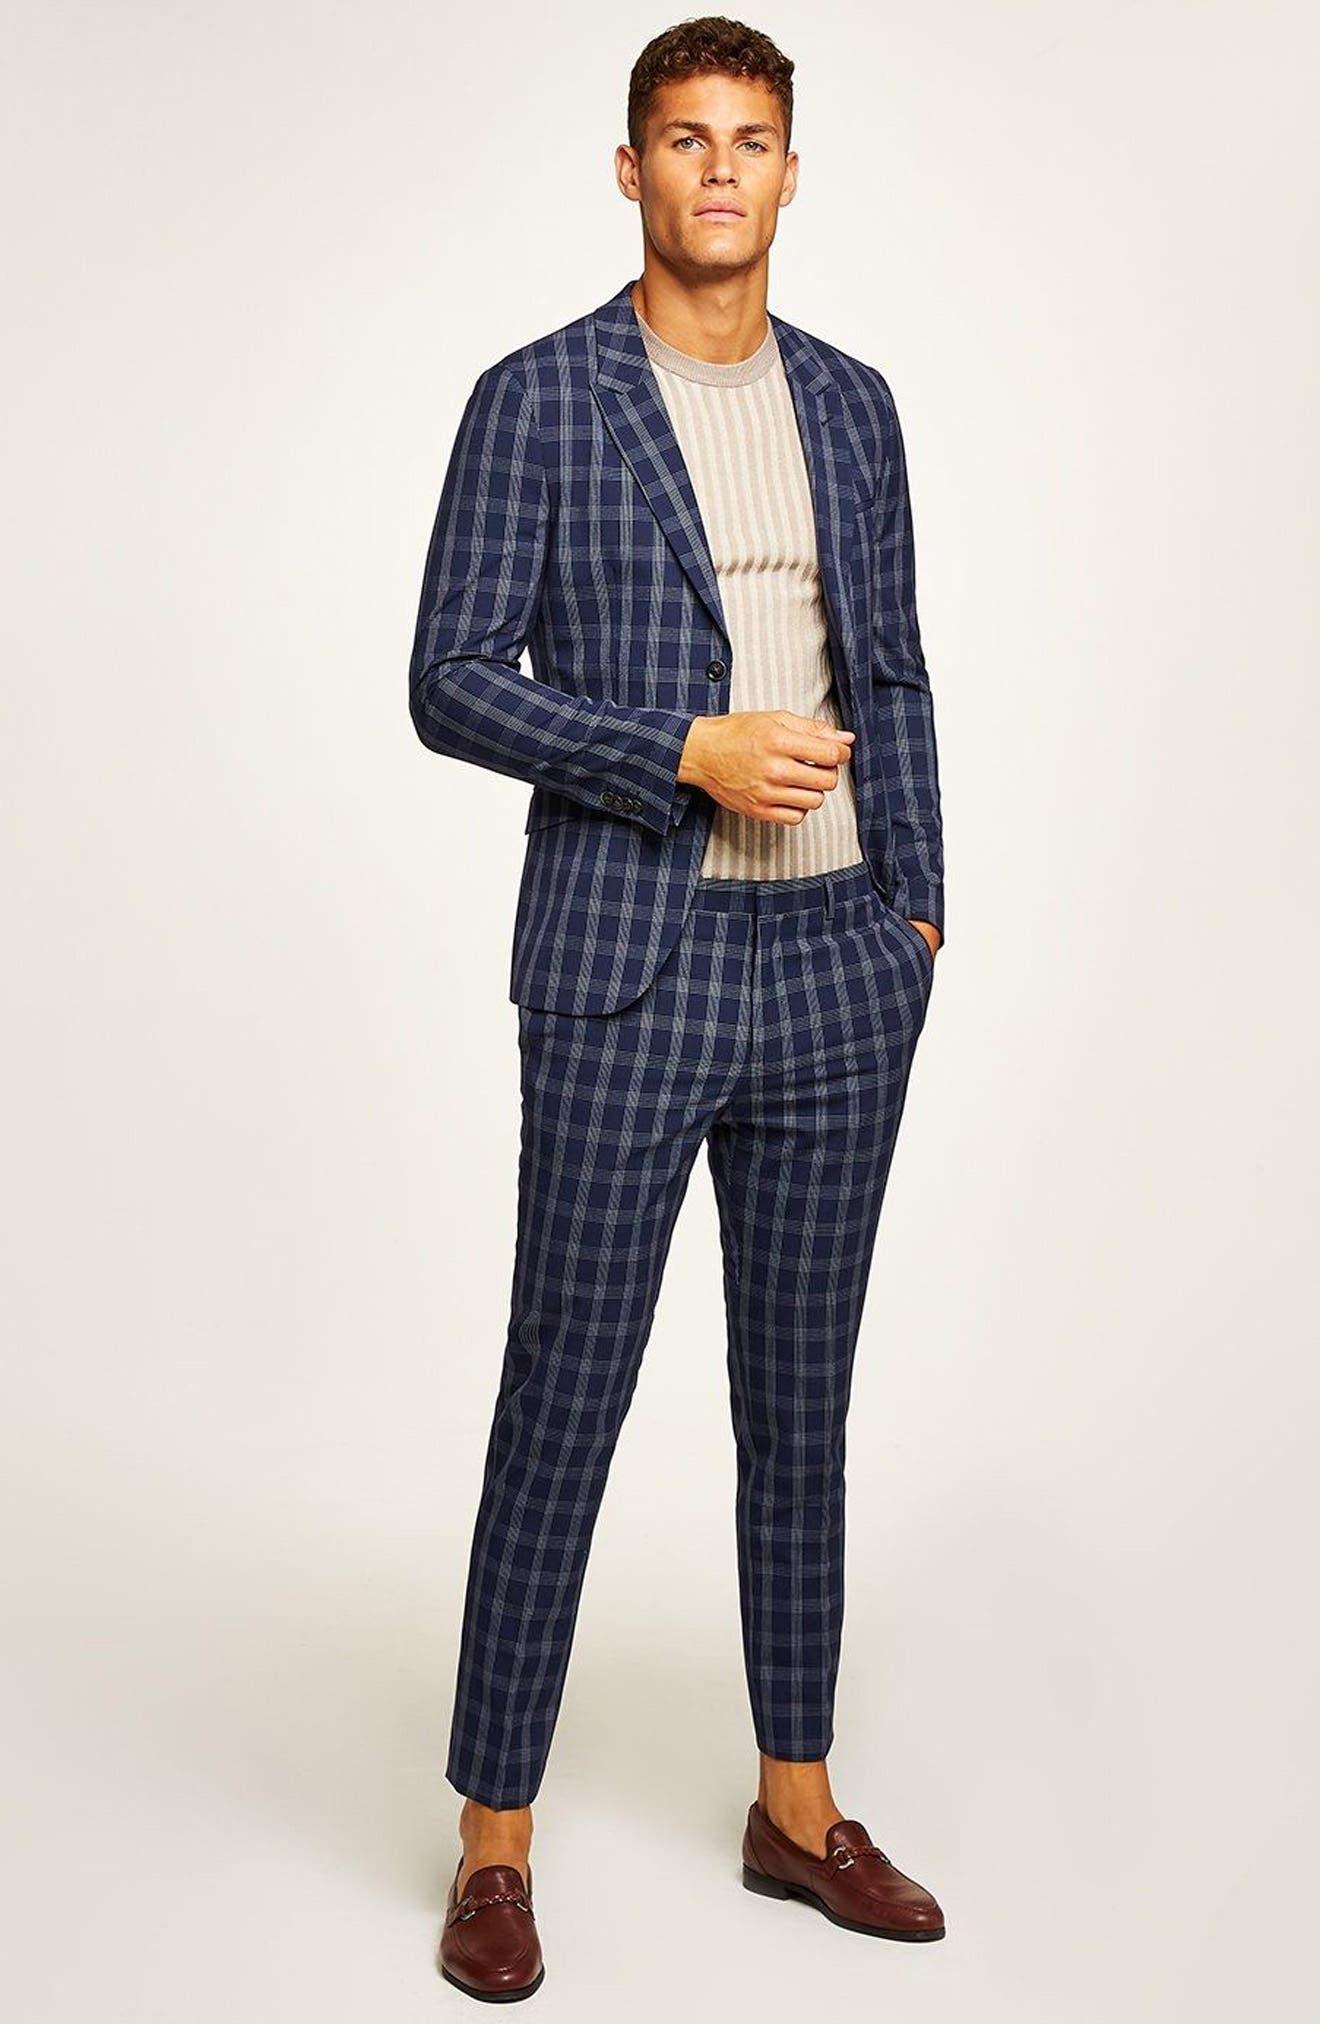 Muscle Fit Check Suit Trousers,                             Alternate thumbnail 4, color,                             NAVY BLUE MULTI